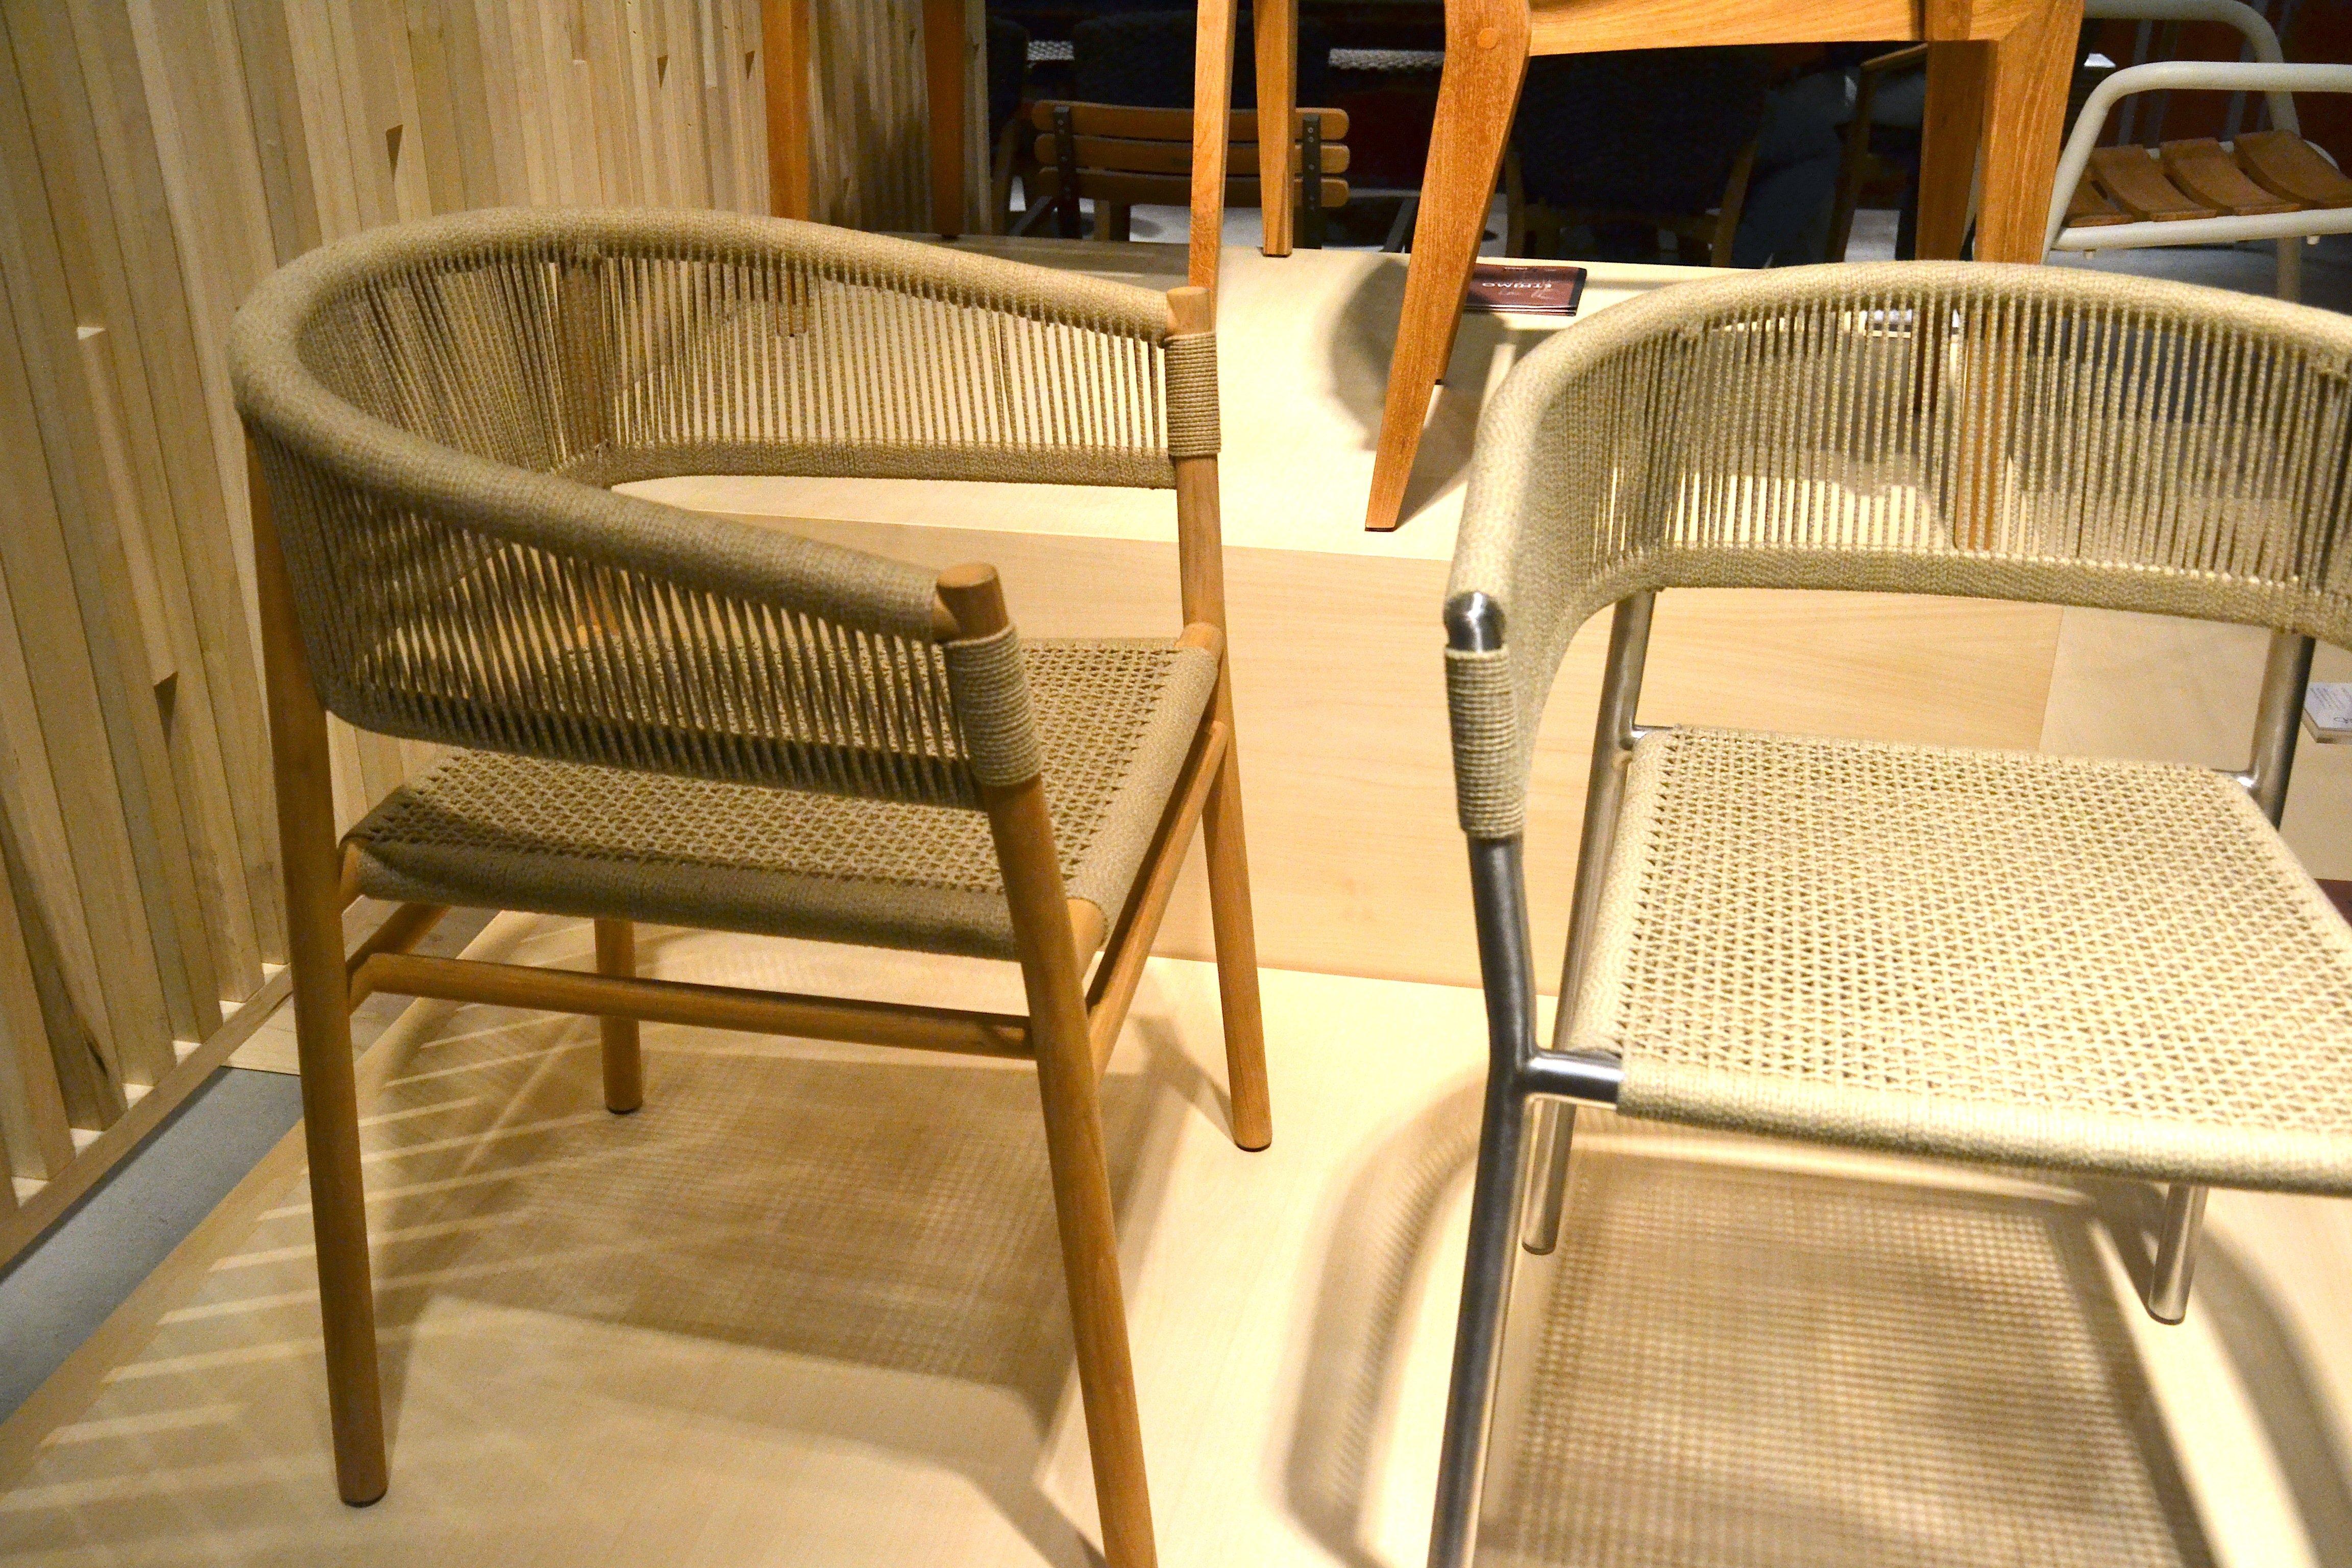 Tavoli Da Giardino Risparmio Casa : Sedie in plastica risparmio casa ~ bukadar.info = galleria di sedie